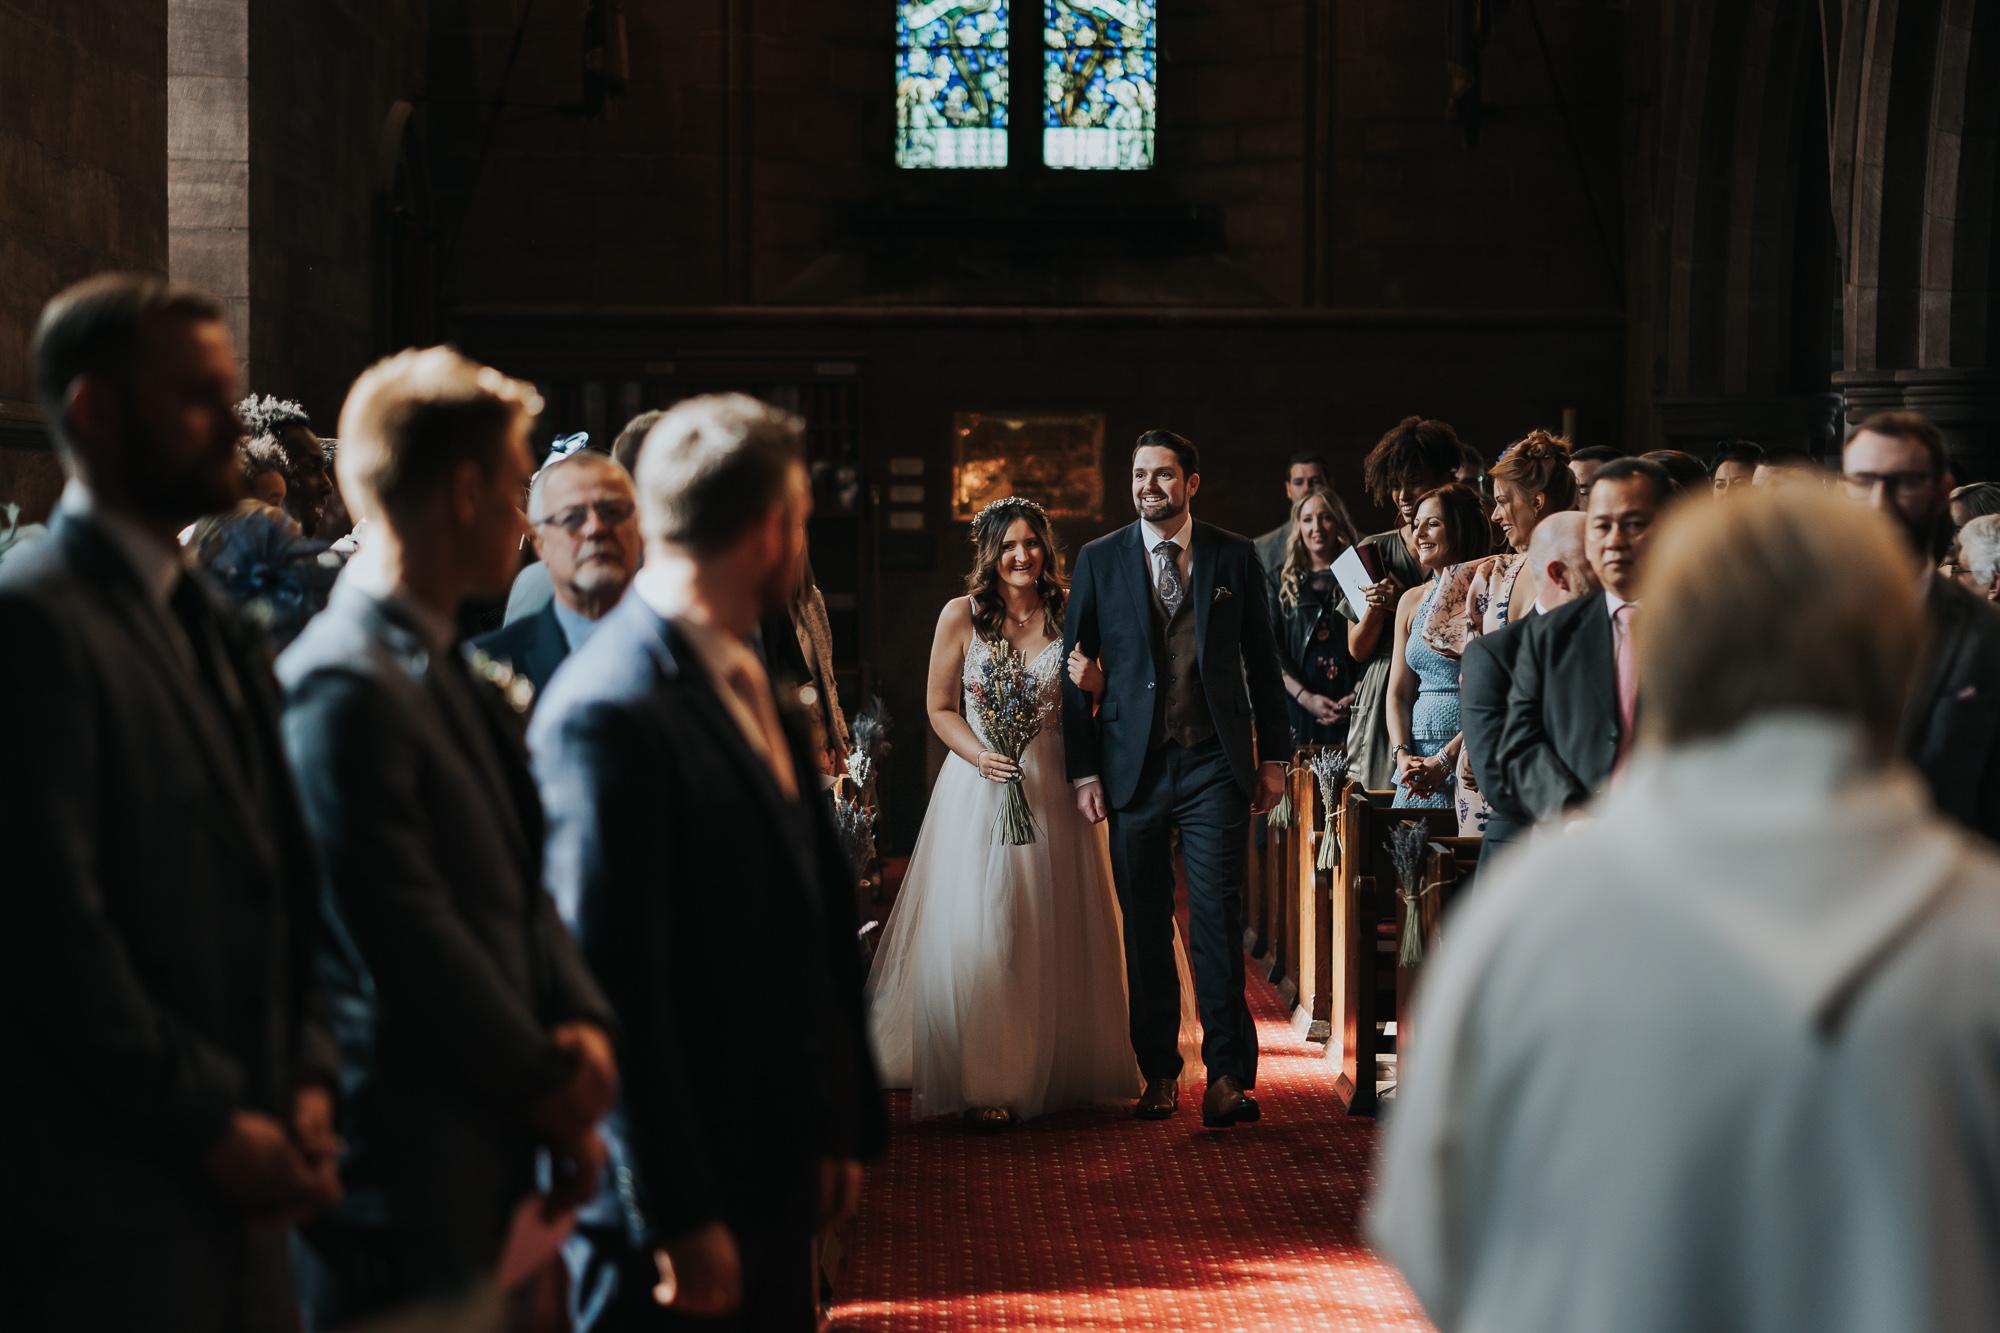 farm wedding in cheshire wedding photographer based in liverpool  (6 of 36).jpg